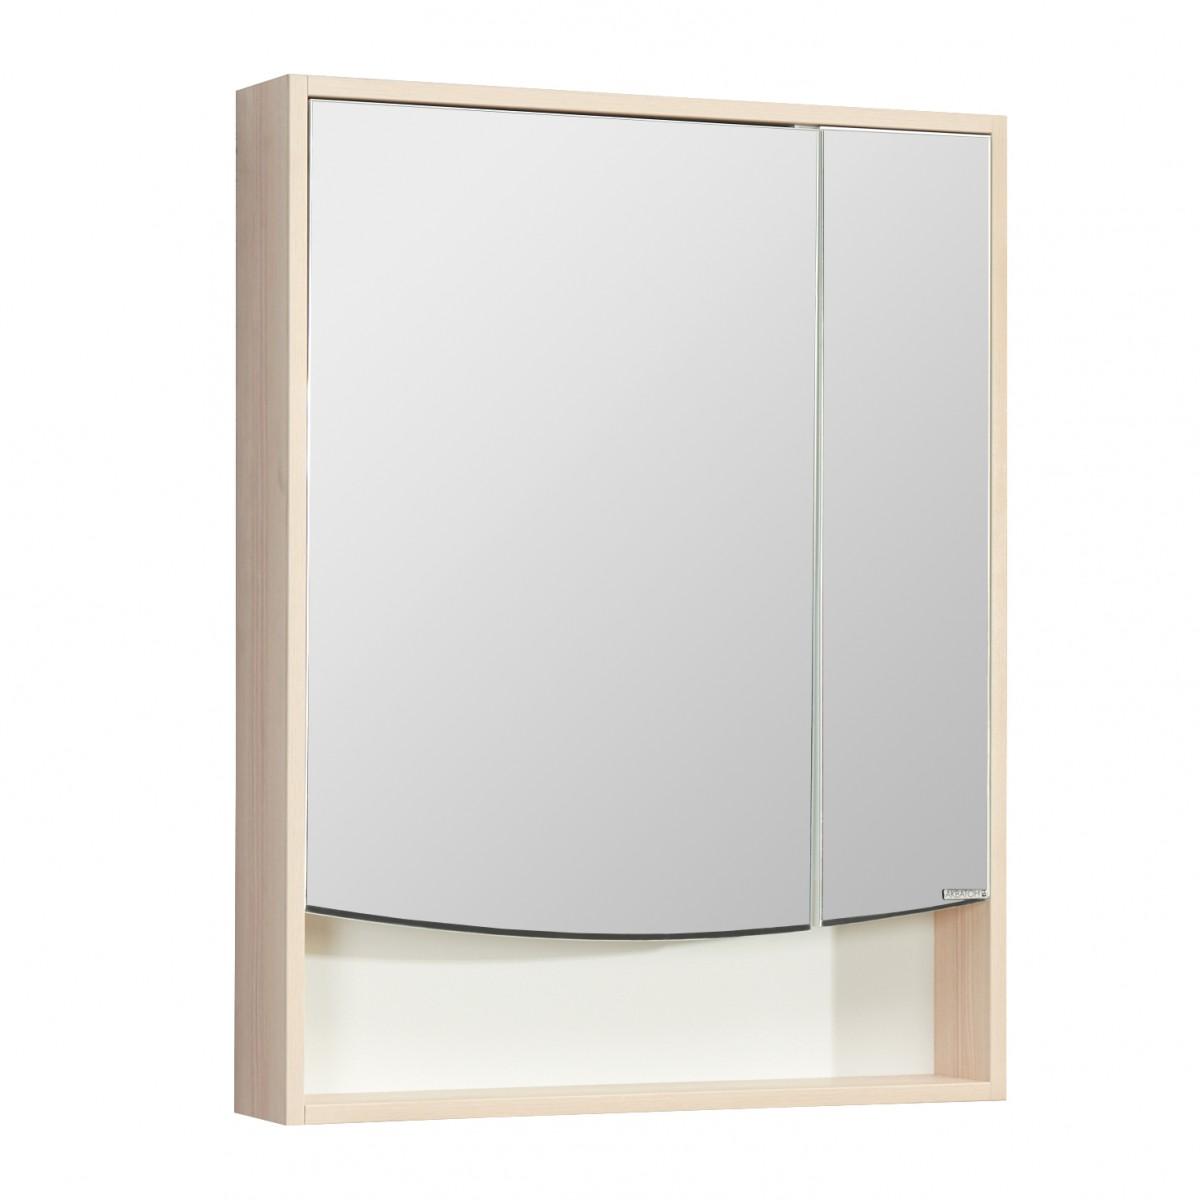 Зеркальный шкаф Акватон Инфинити 65 ясень Коимбра